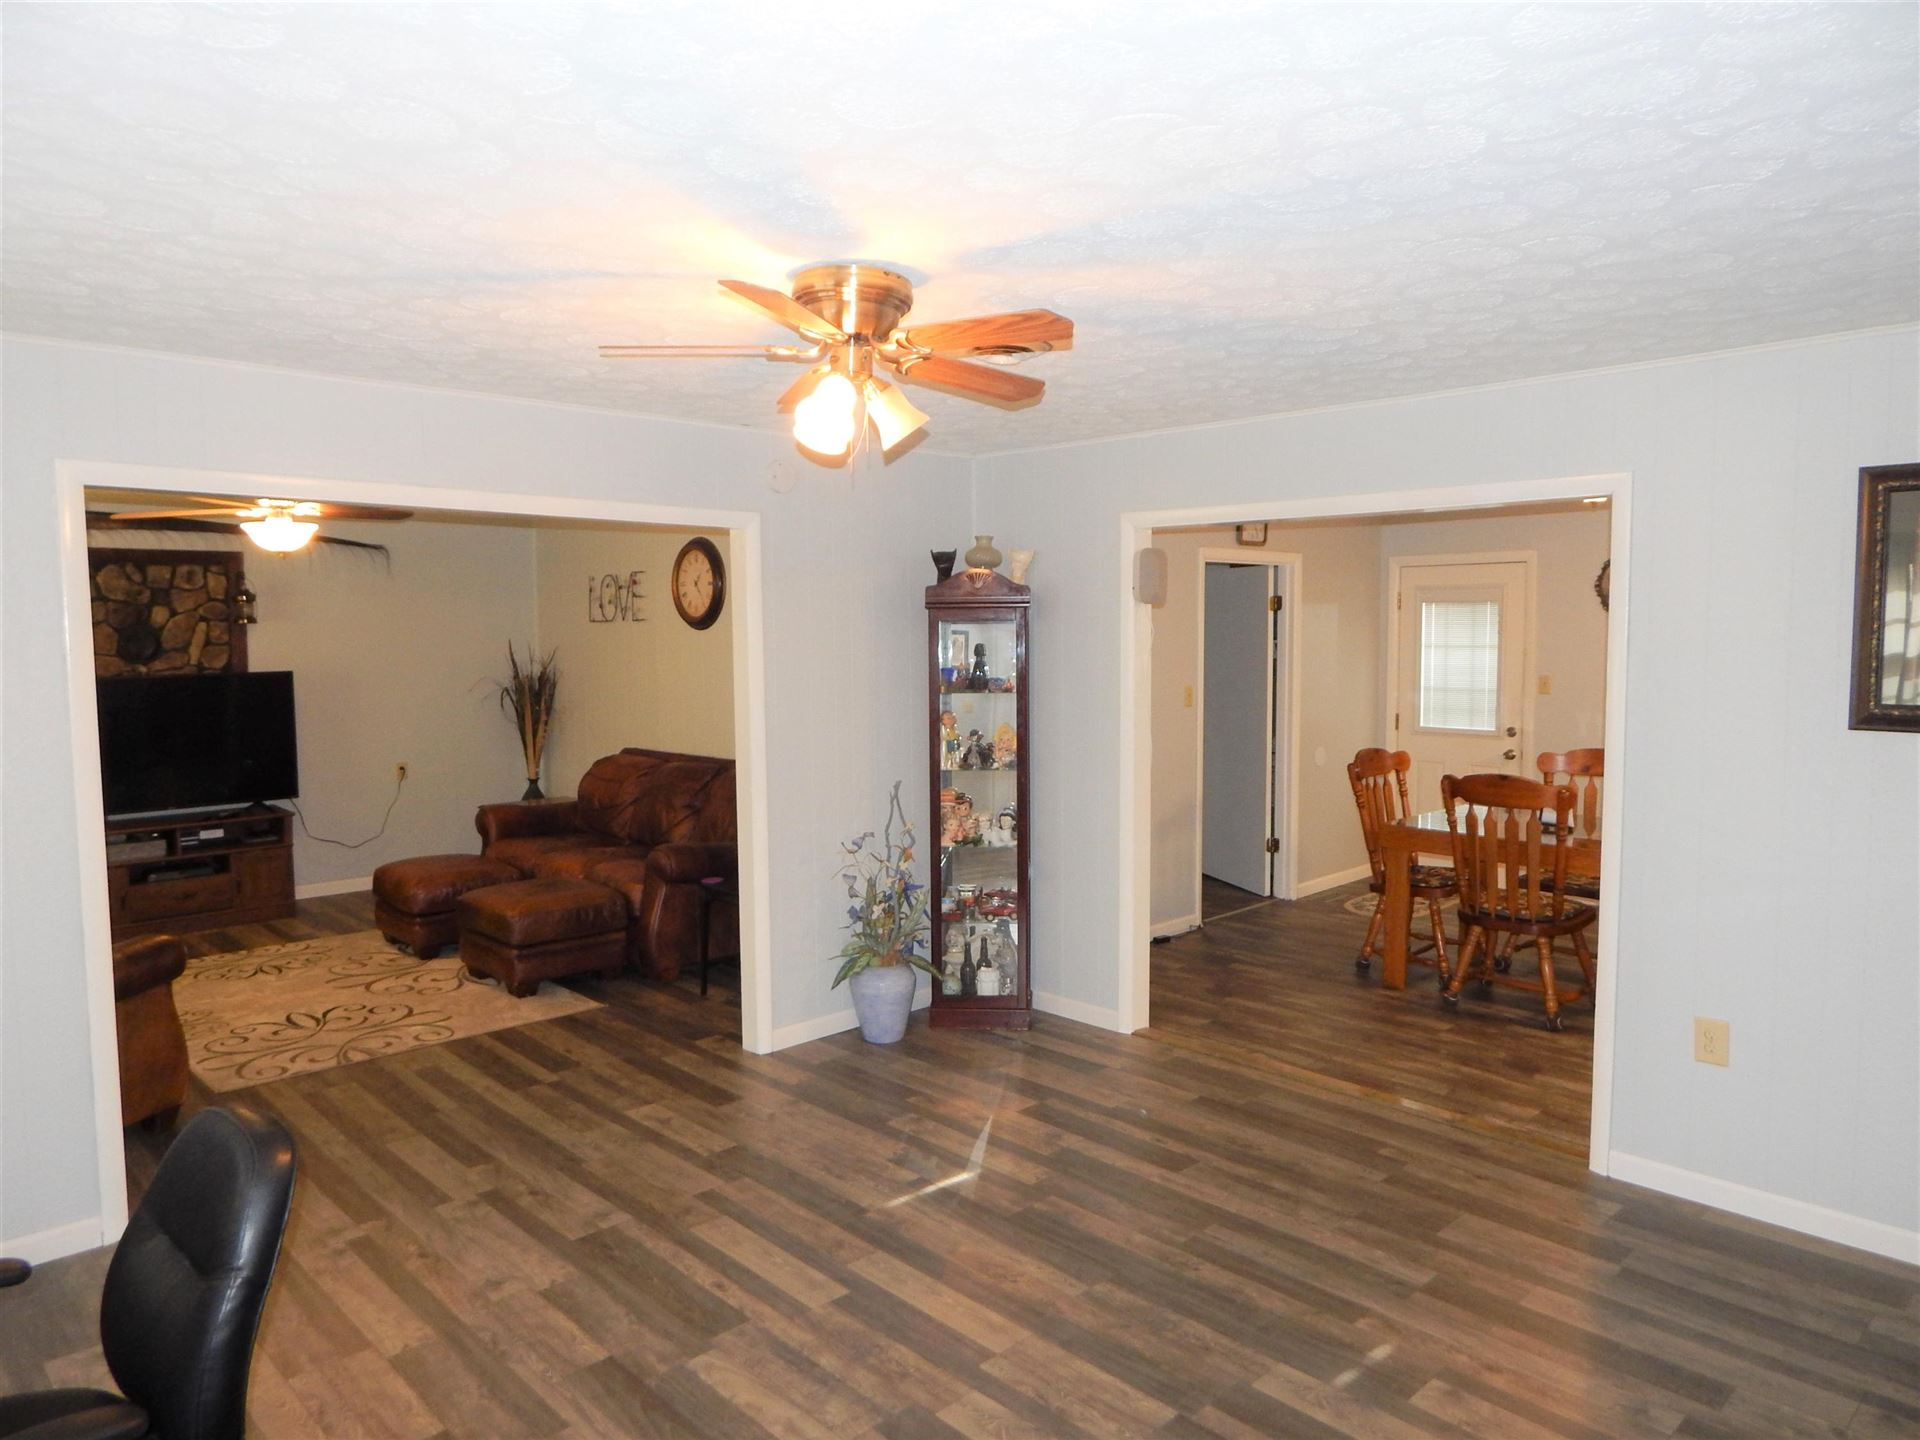 Photo of 481 Norman Drive, Crossville, TN 38571 (MLS # 1140096)